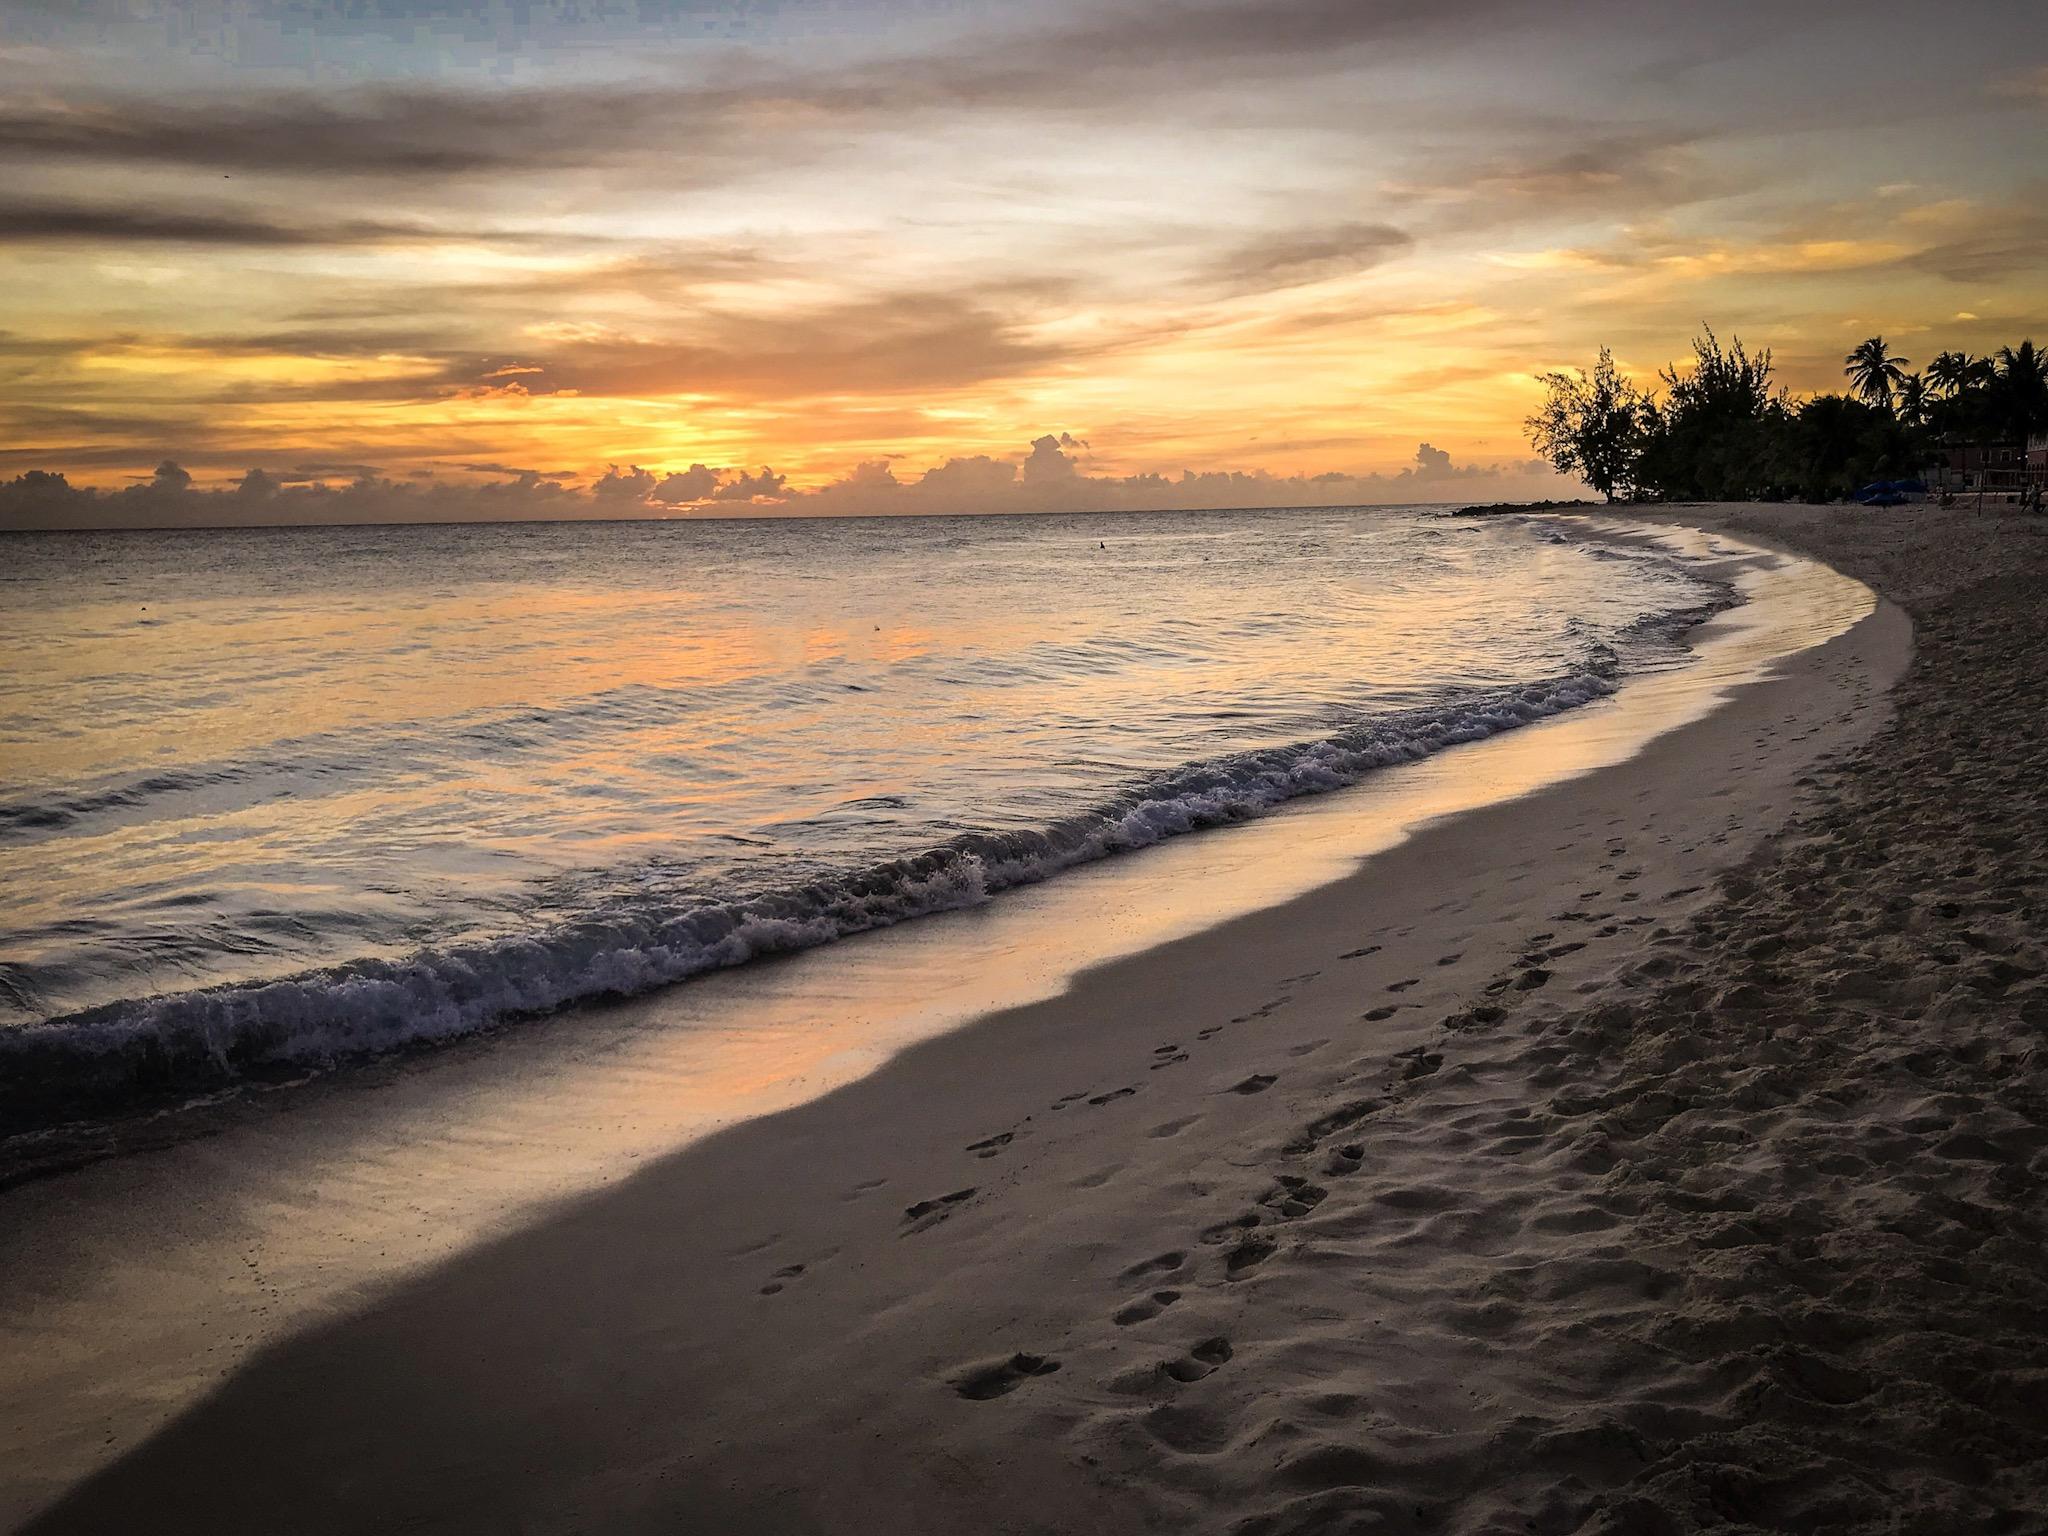 Dover Beach, Barbados - iPhone travel photography